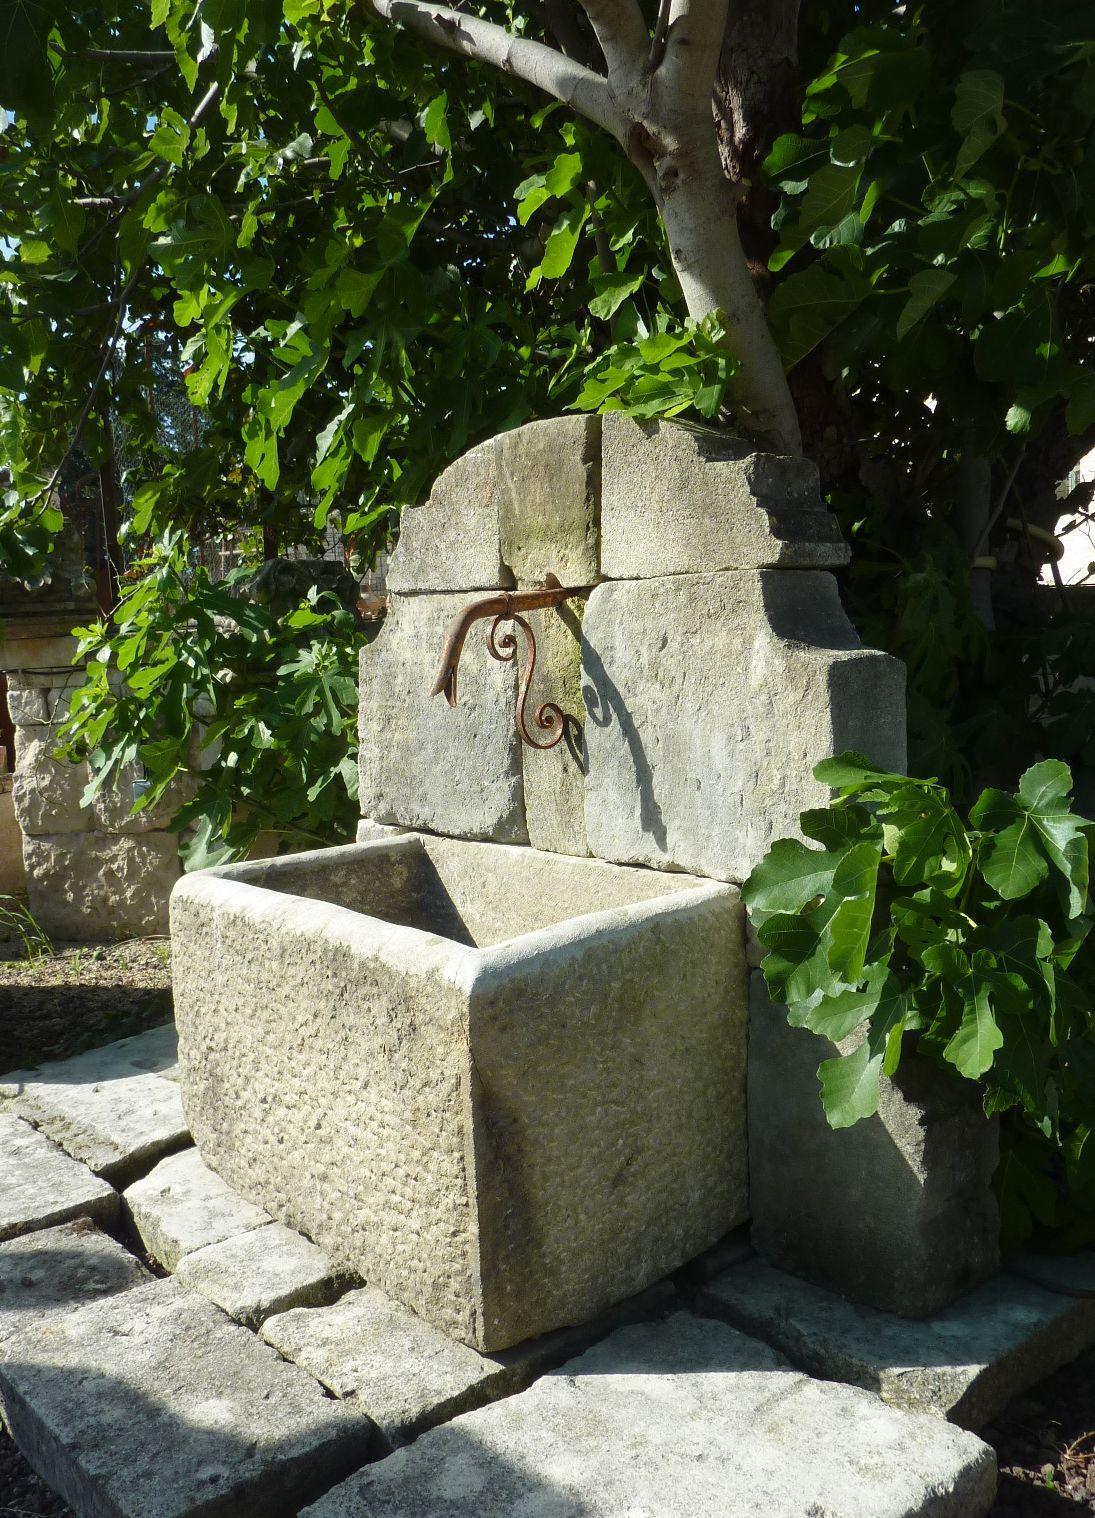 Atelierbidal : Fontaine Murale De Jardin Possédant Un ... intérieur Bassin De Jardin En Pierre